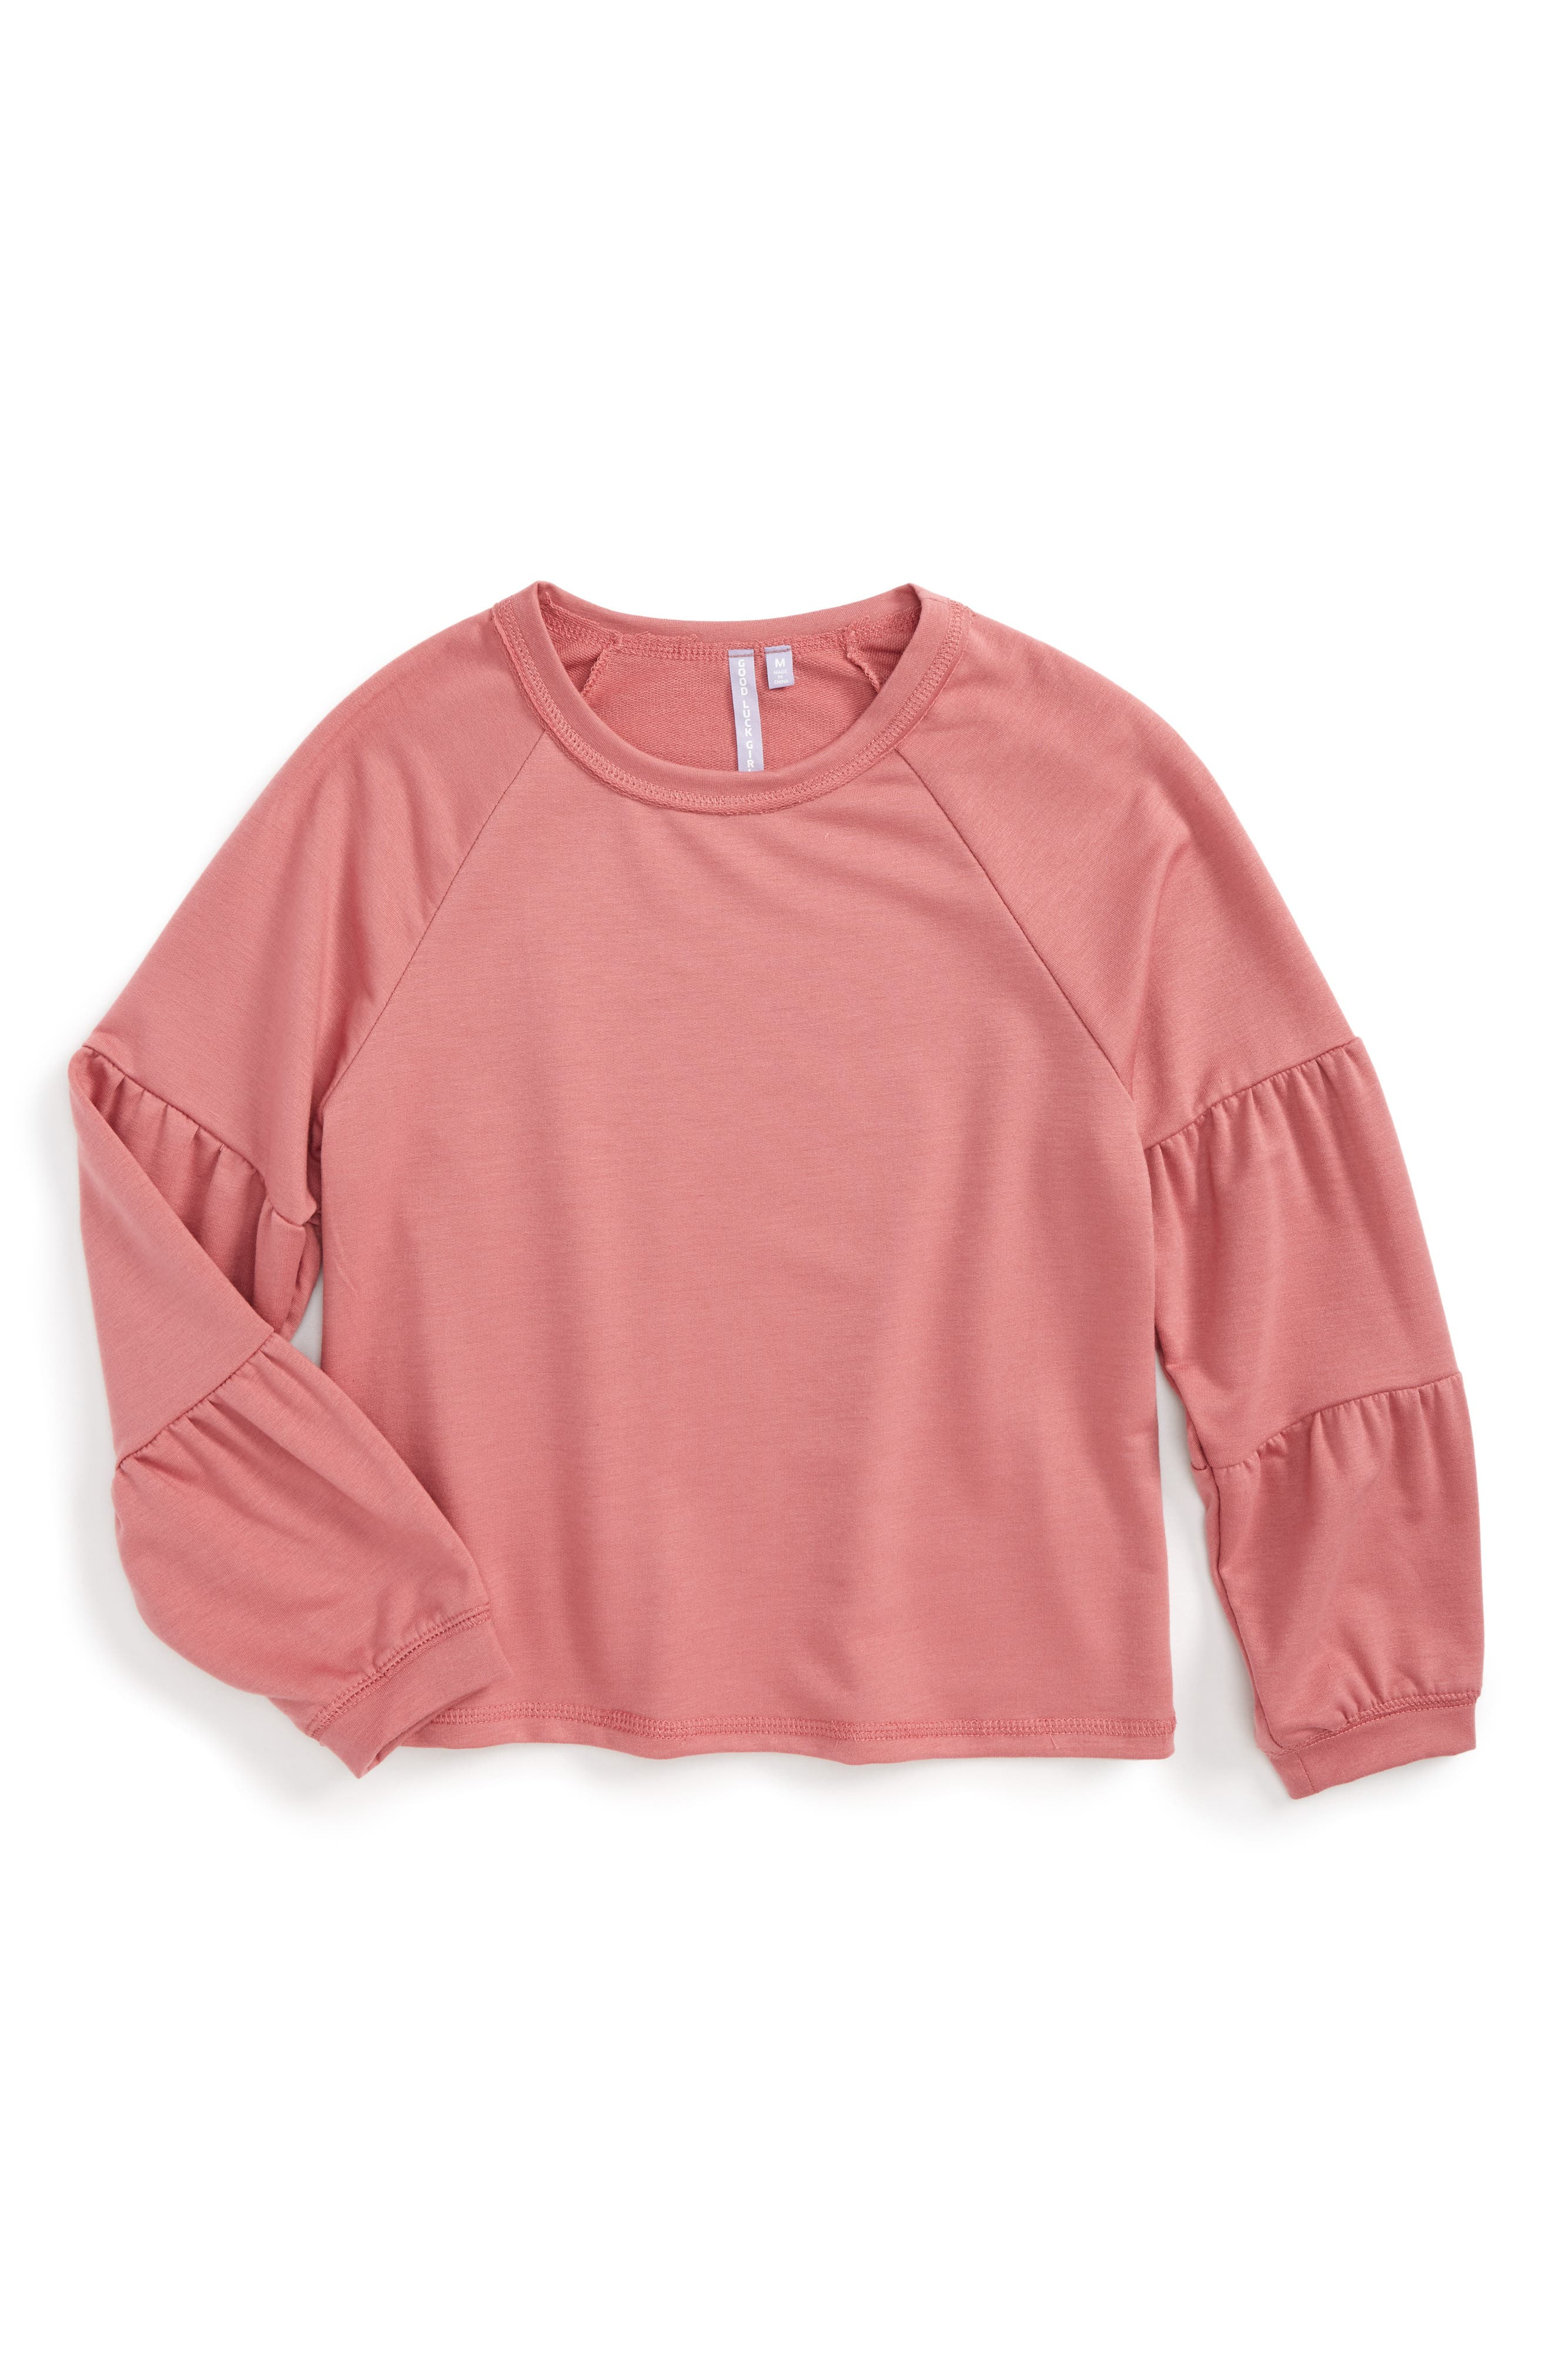 Tiered Sleeve Sweatshirt,                         Main,                         color, 551